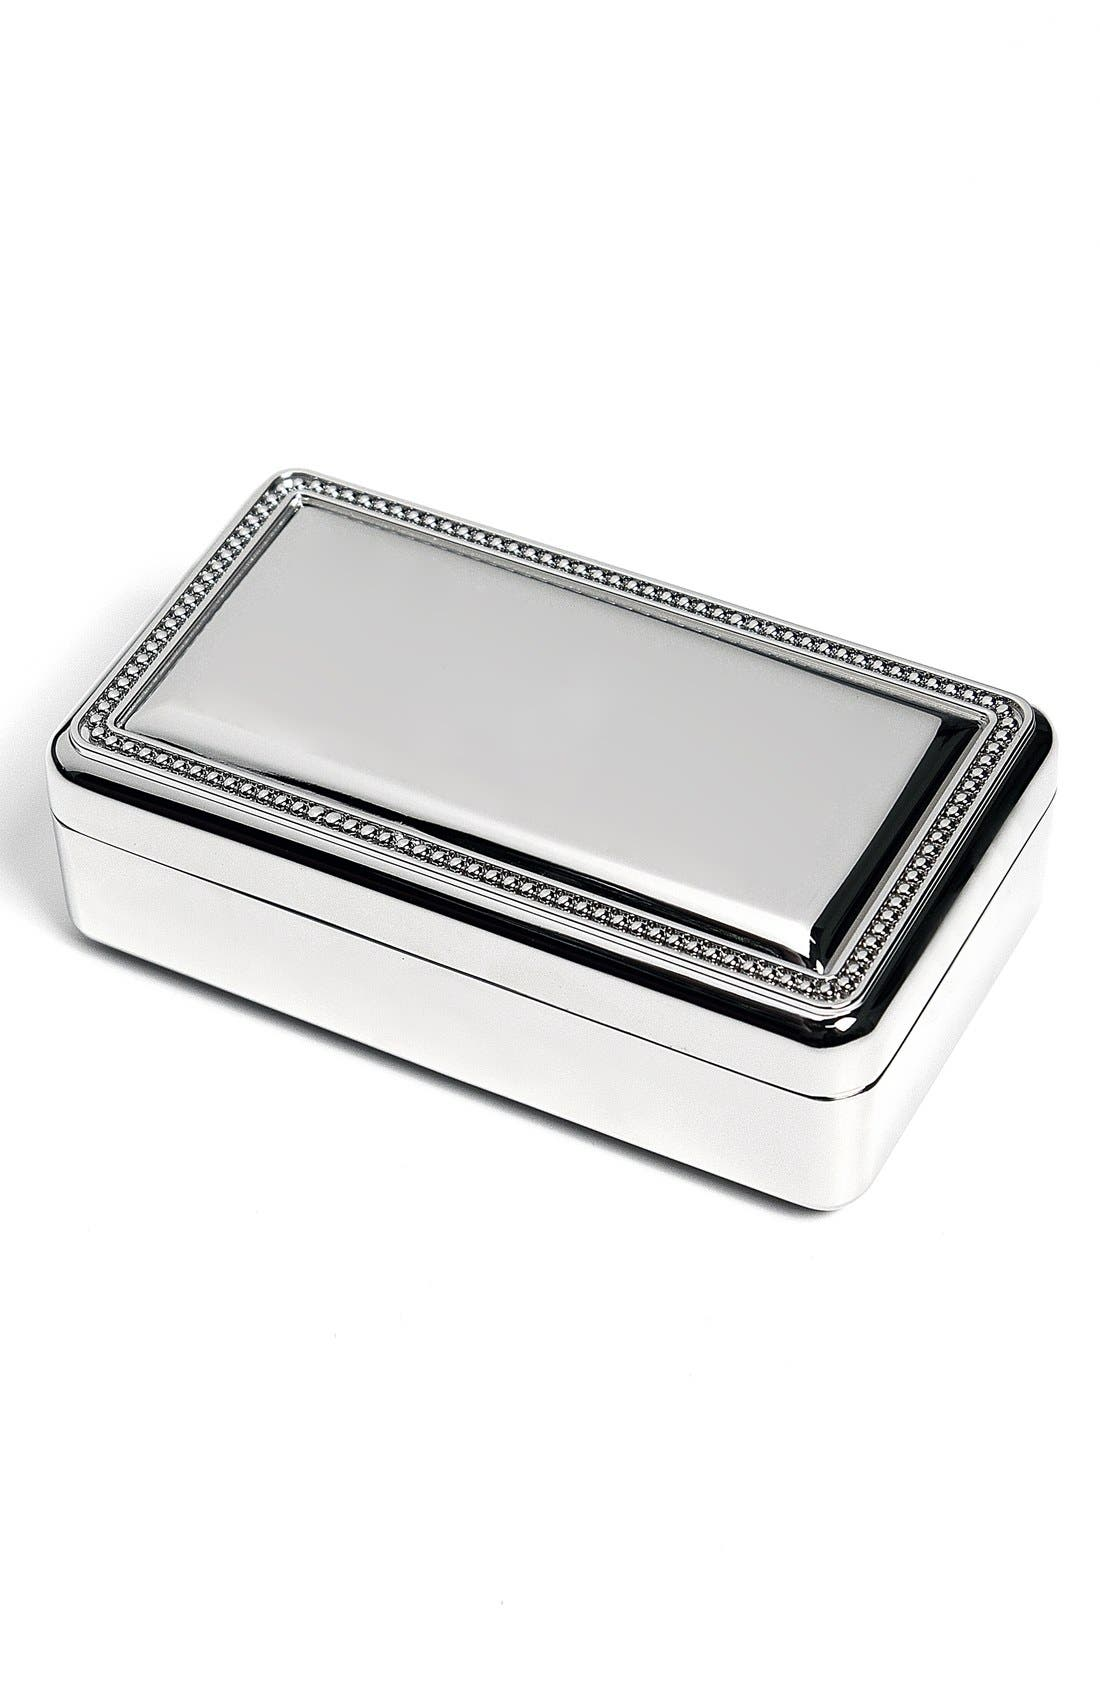 Cathys Concepts Monogram Jewelry Box,                         Main,                         color, 040